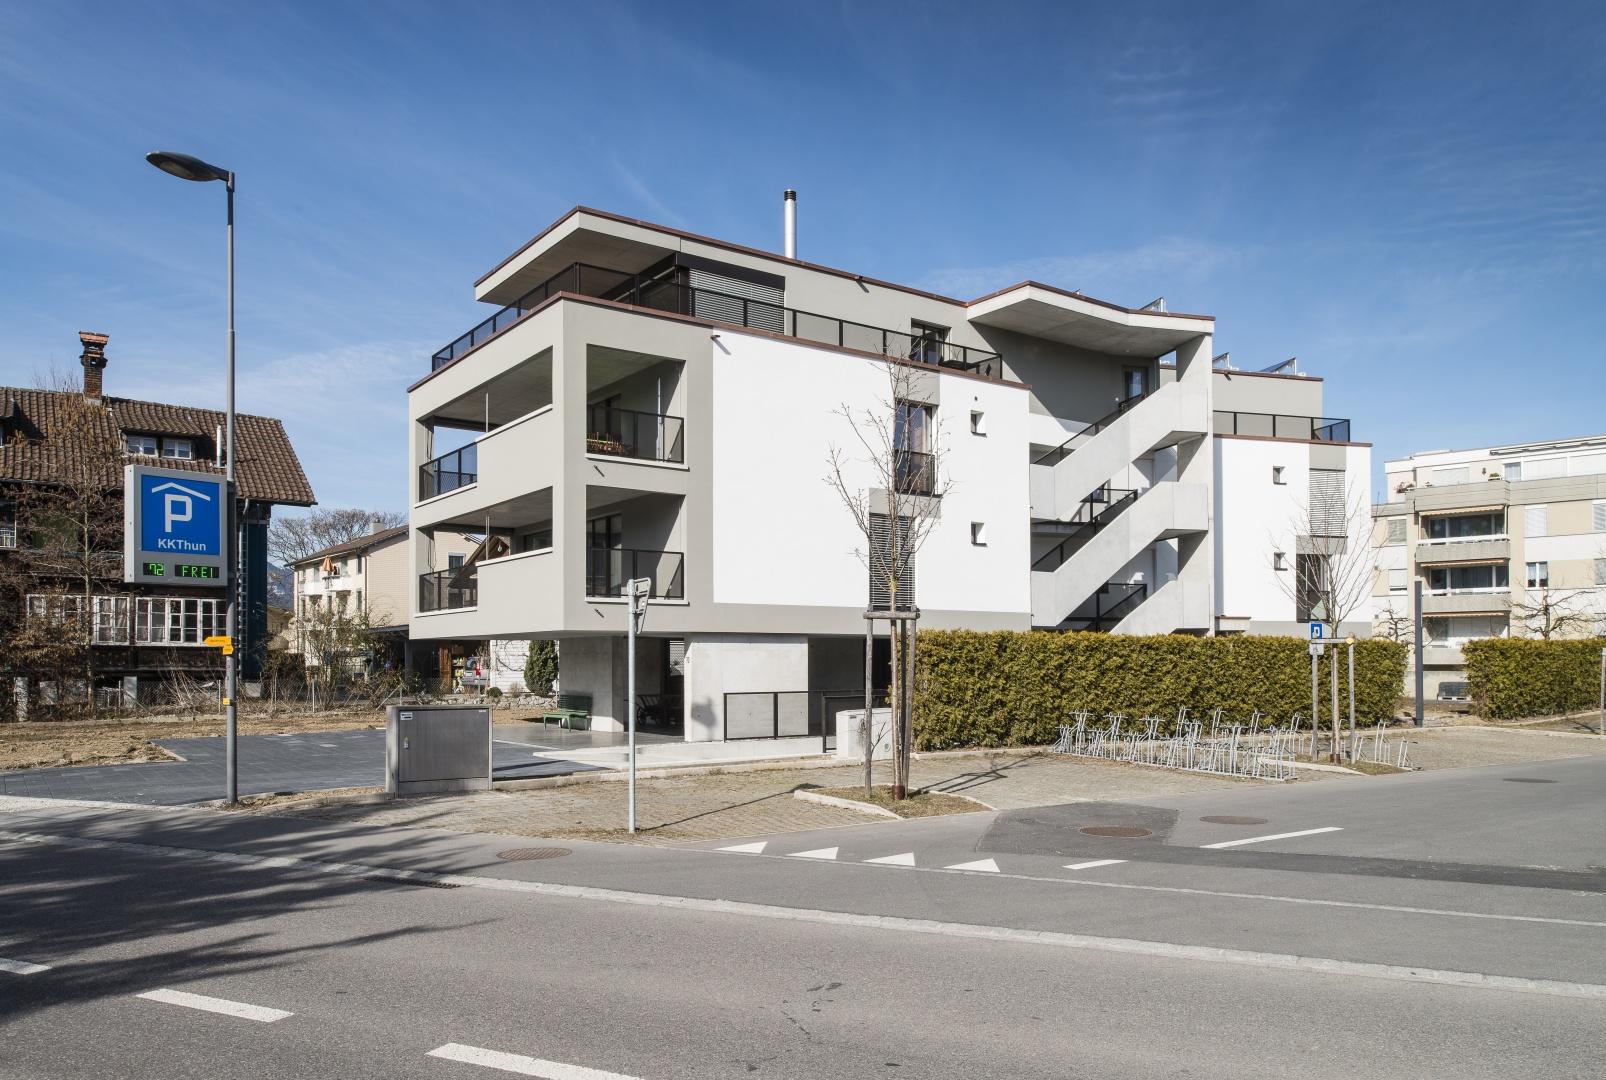 Neubau mehrfamilienhaus thun schweizer baudokumentation for Mehrfamilienhaus neubau